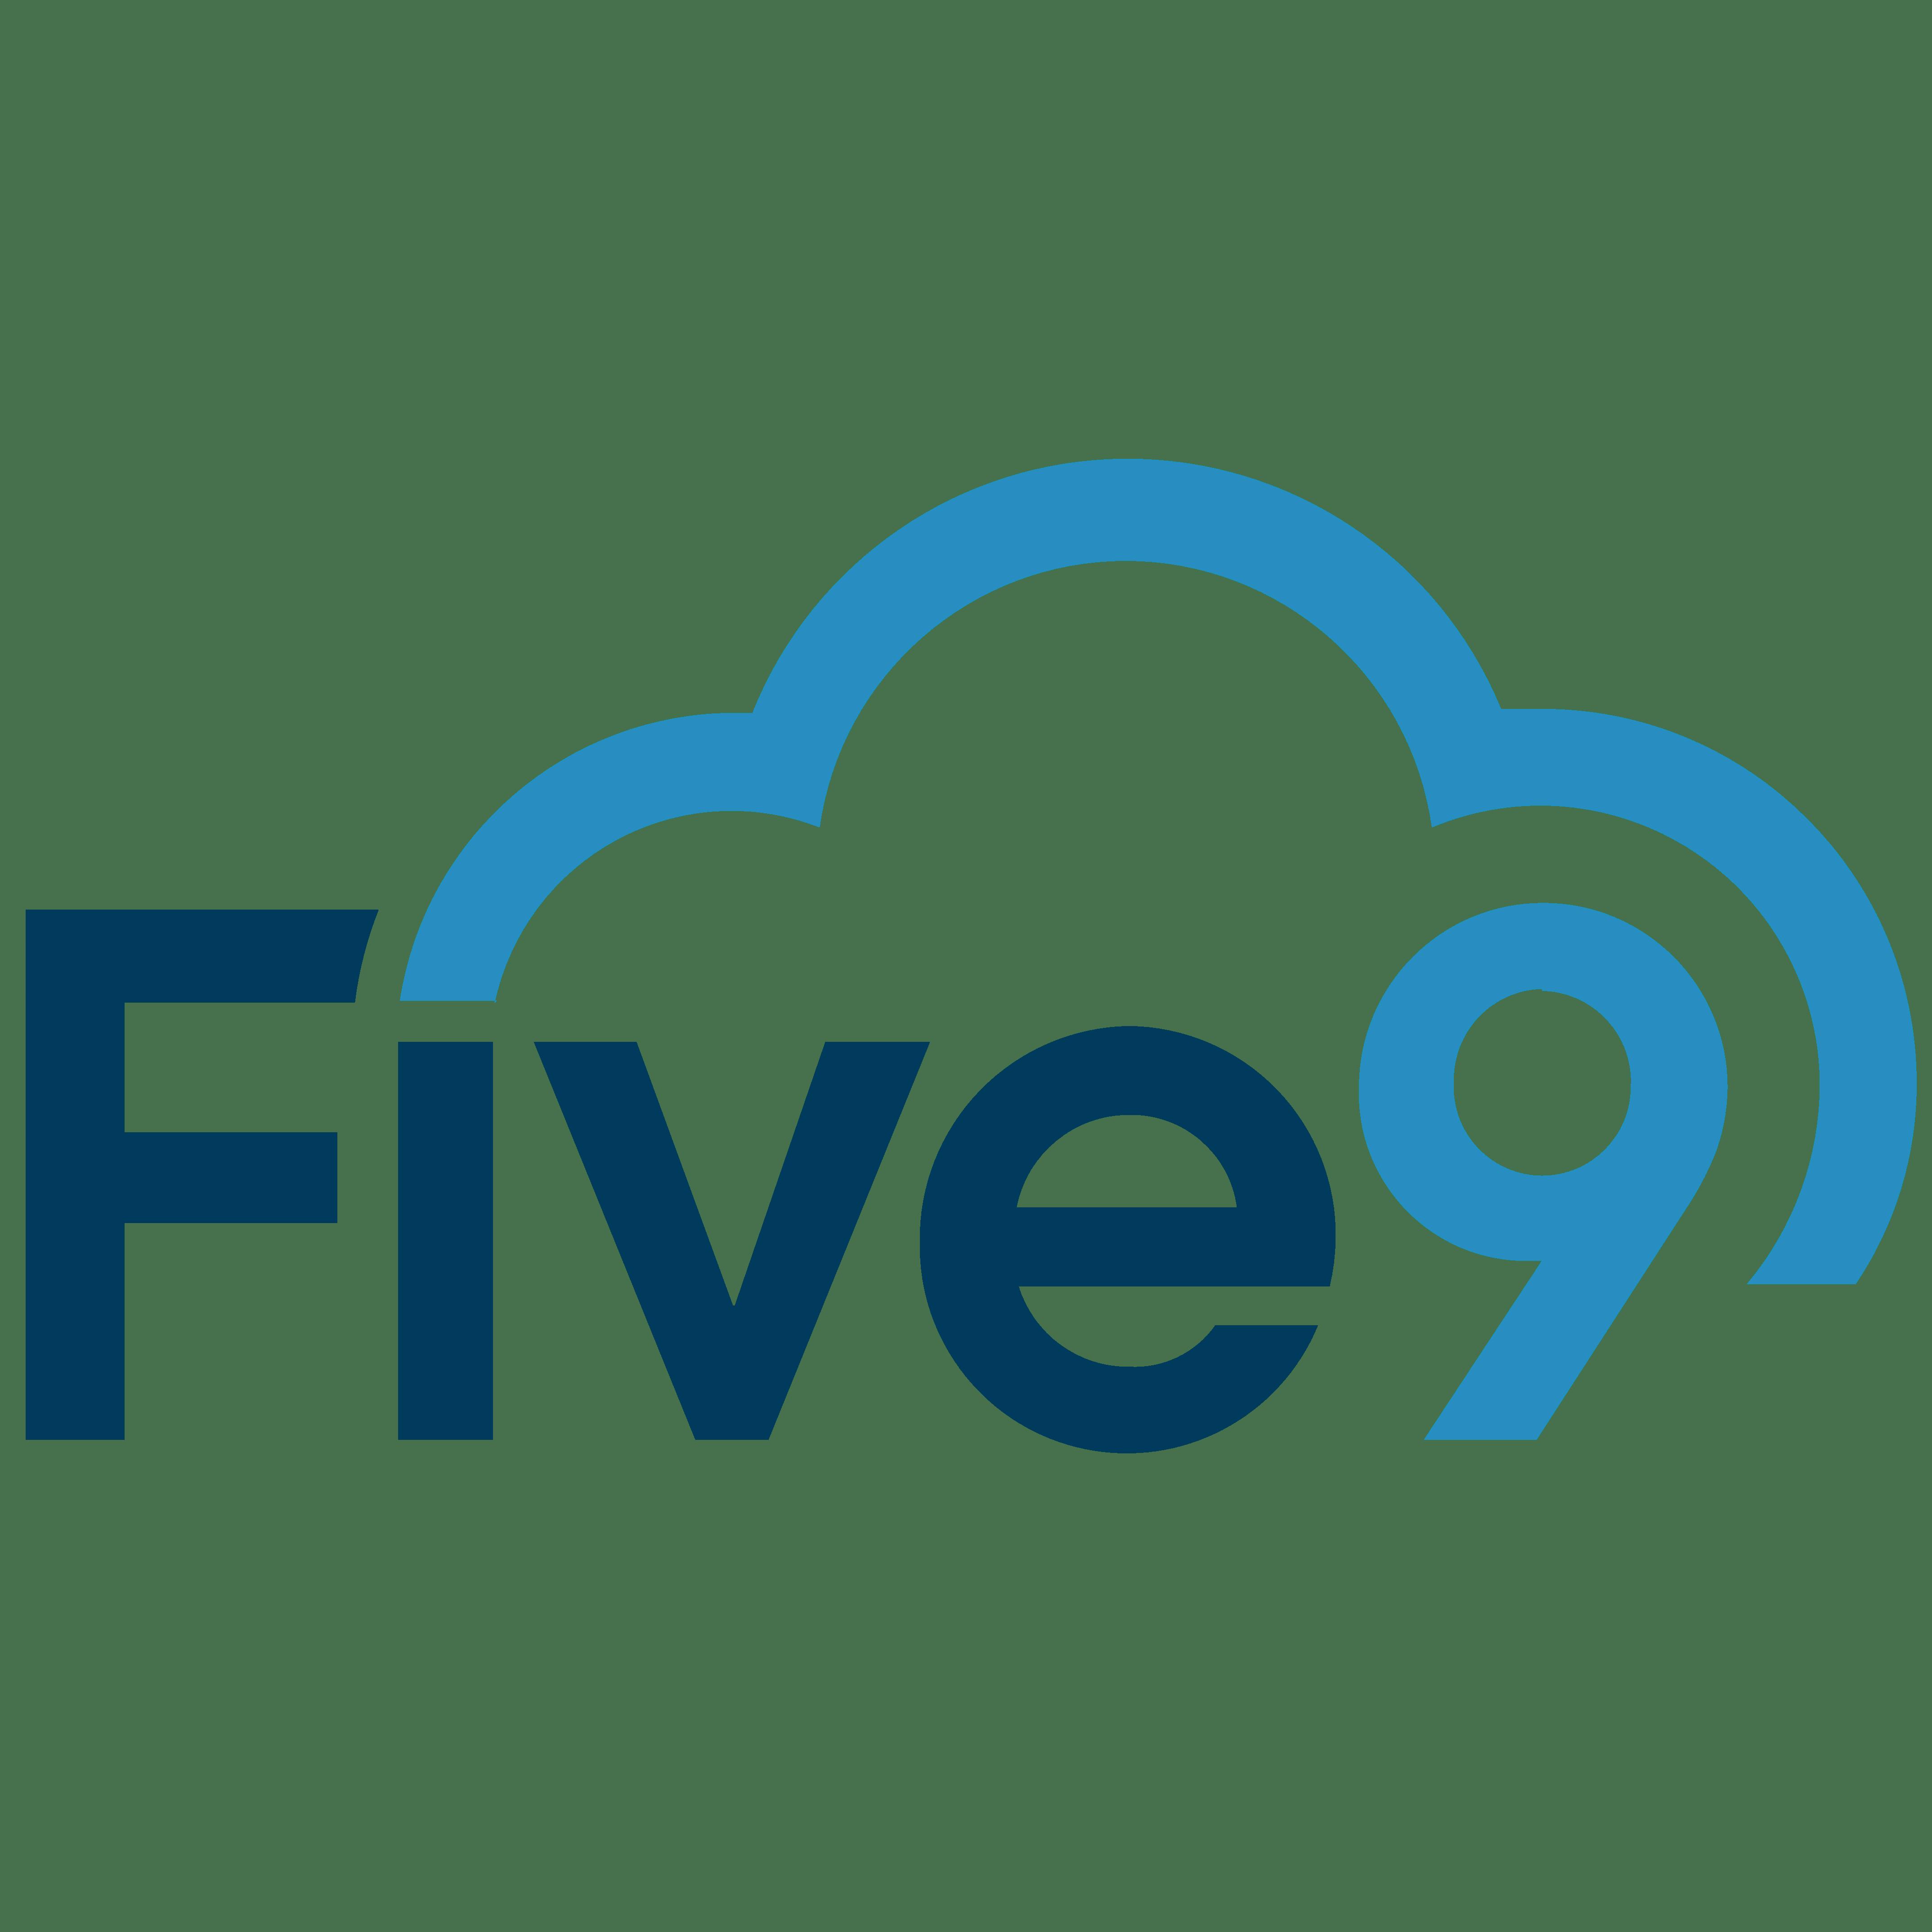 Five9 | Fundamentale Aktienanalyse